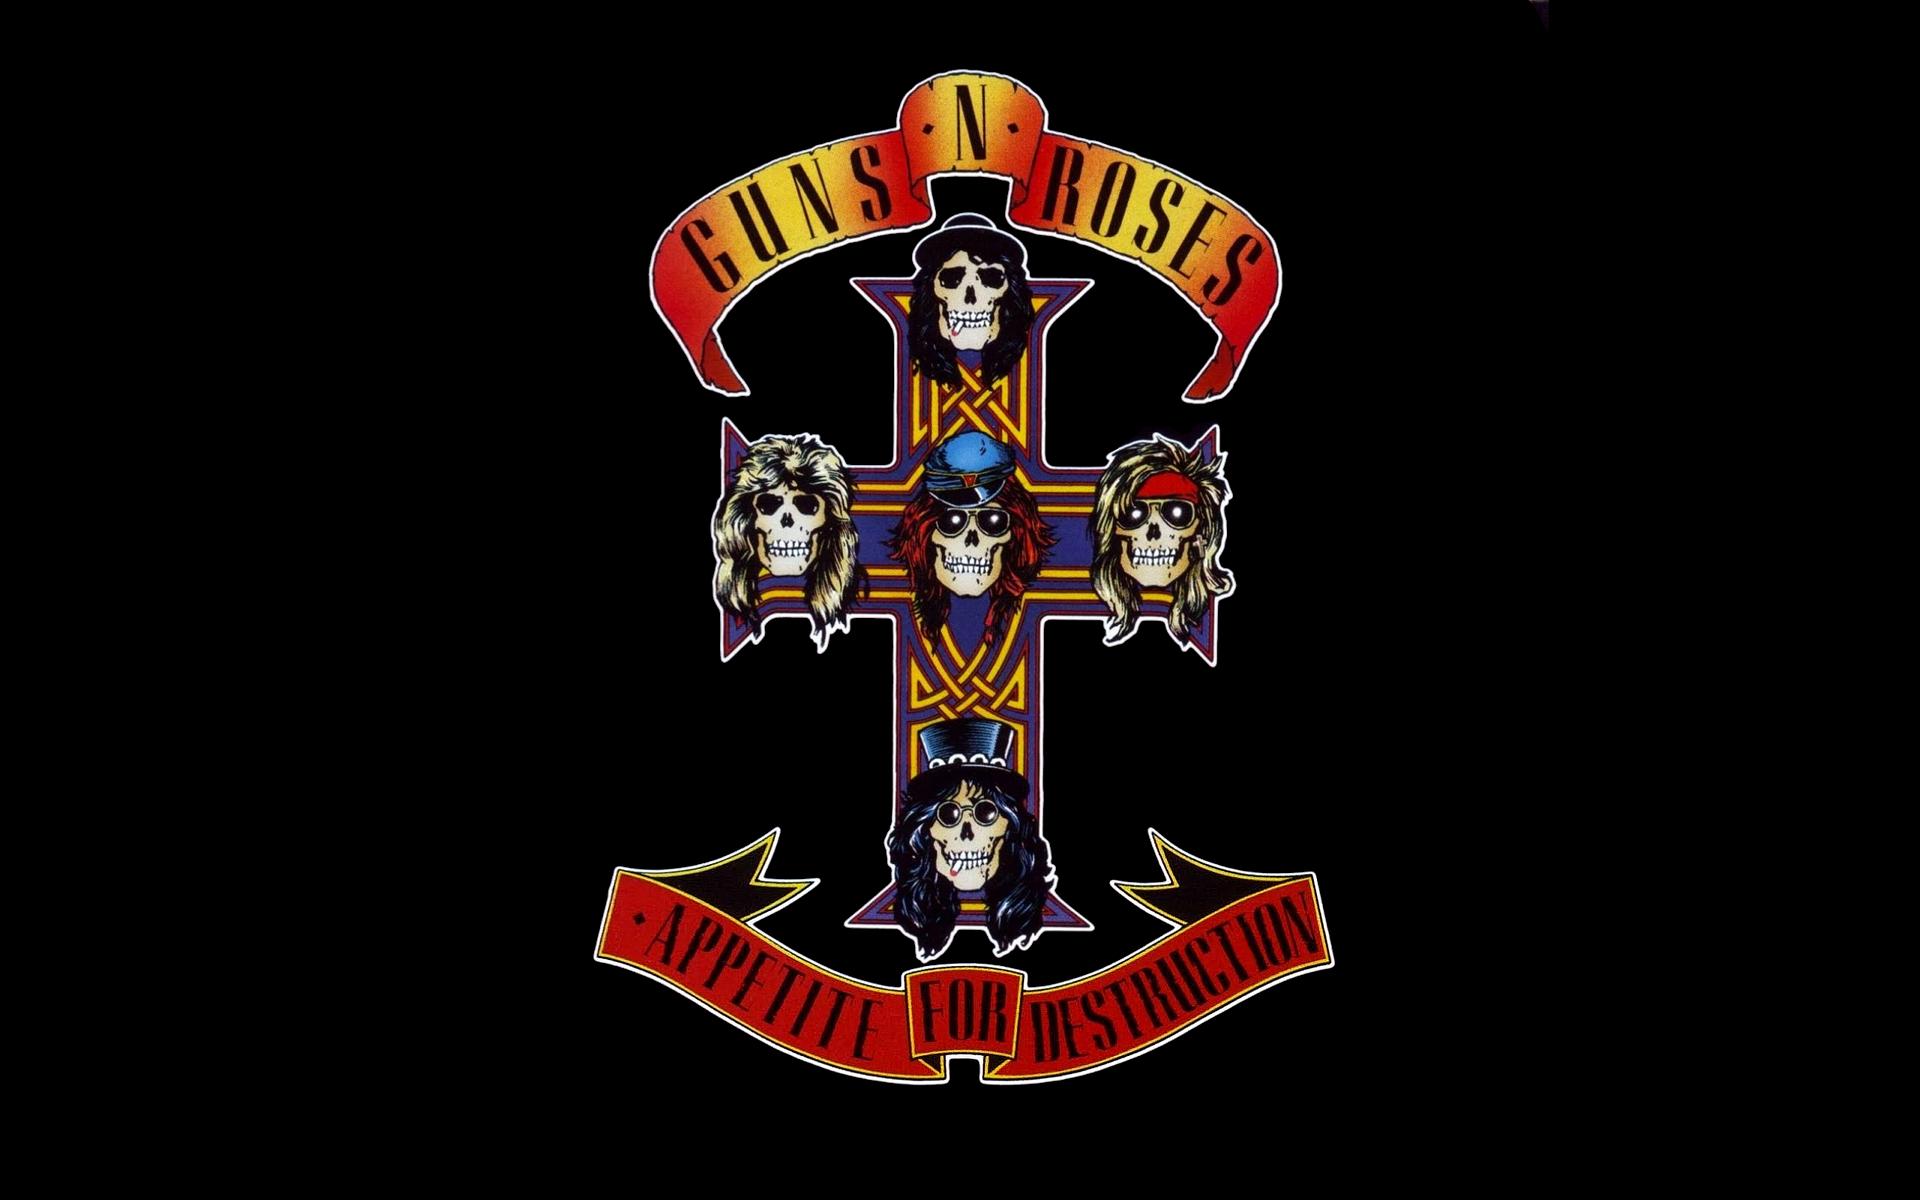 Guns N Roses Tour  Review